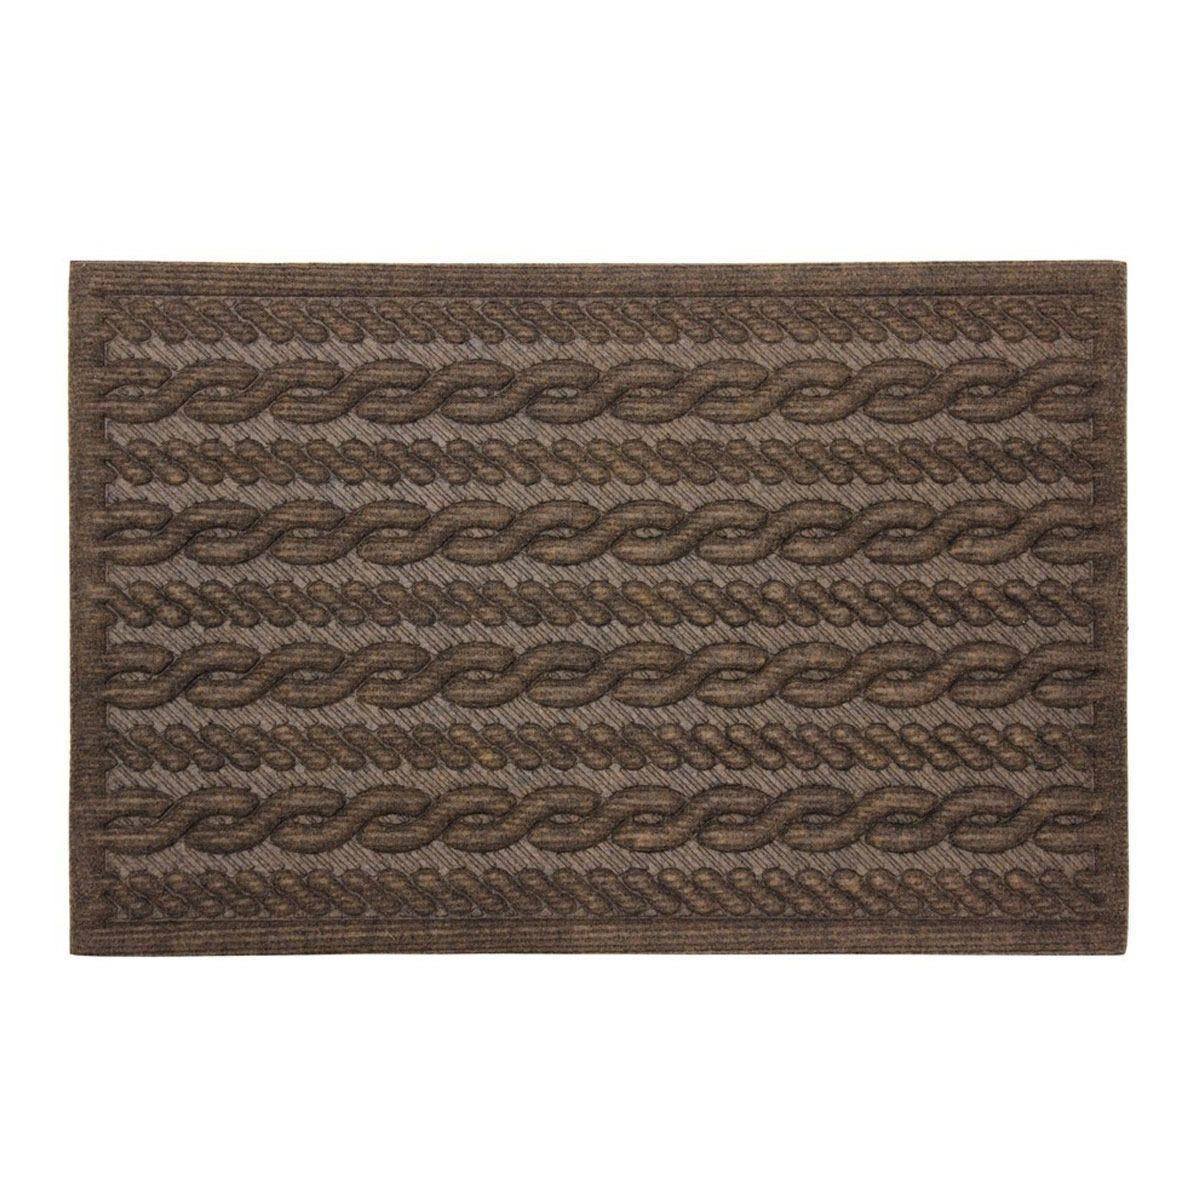 JVL Knit Design Scraper 40 x 60cm Brown Door Mat - Cable